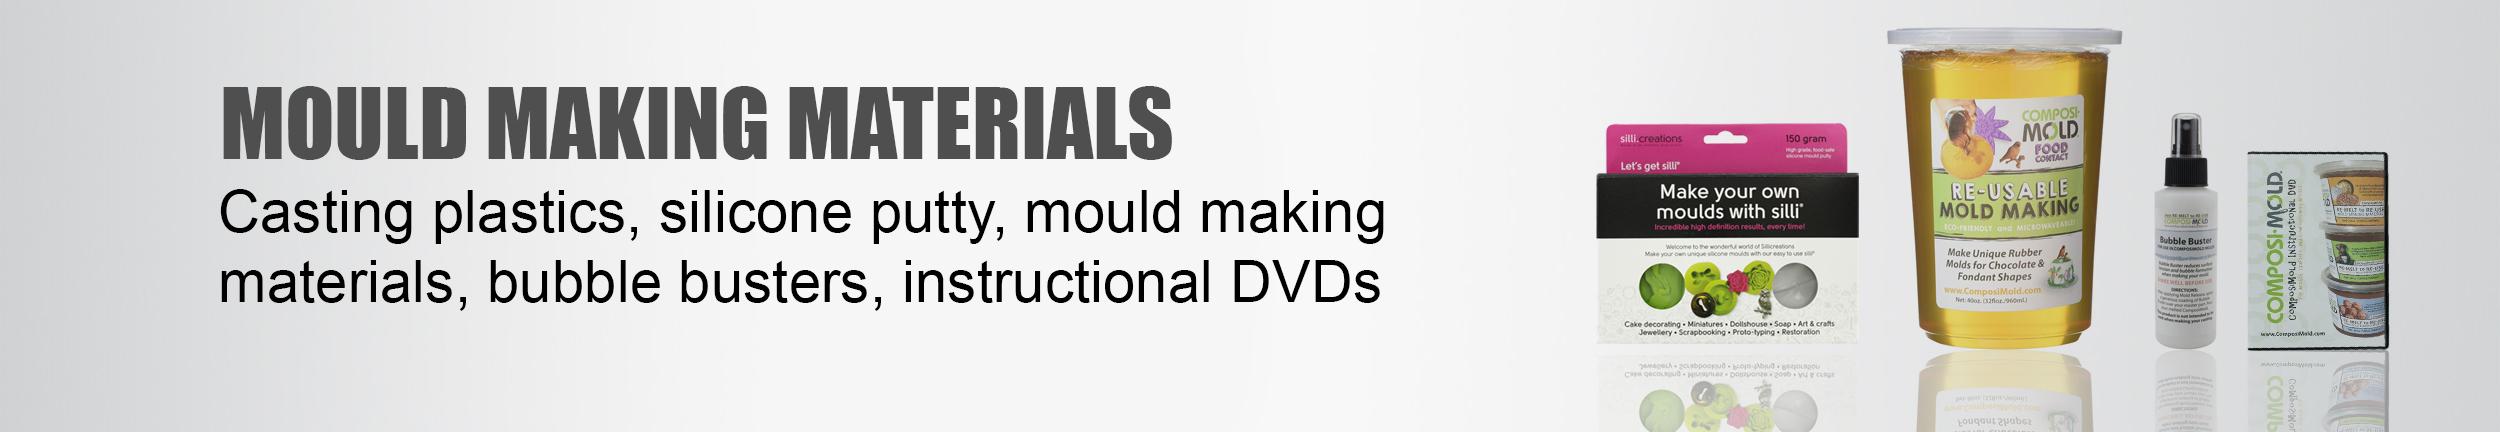 Mould Making Materials